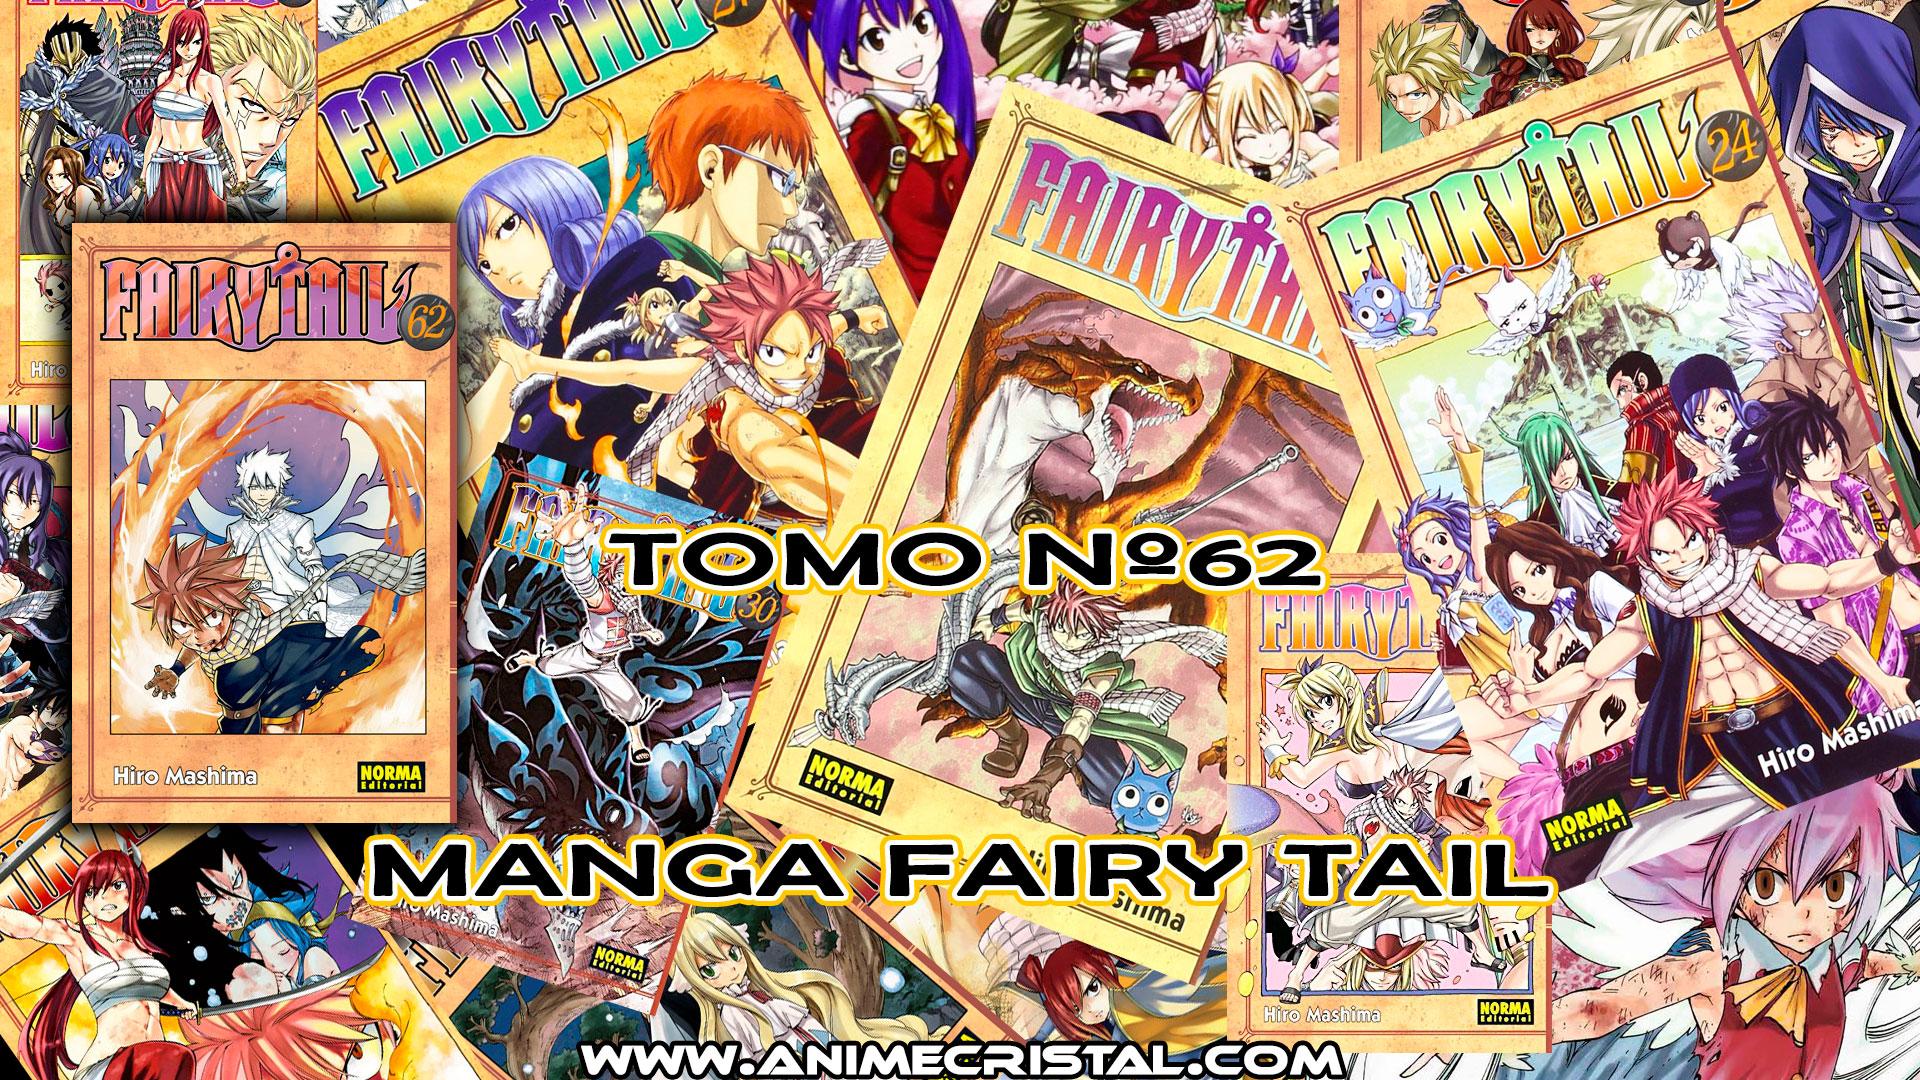 Fairy Tail Manga 62 Anime Cristal Tienda Online De Manga